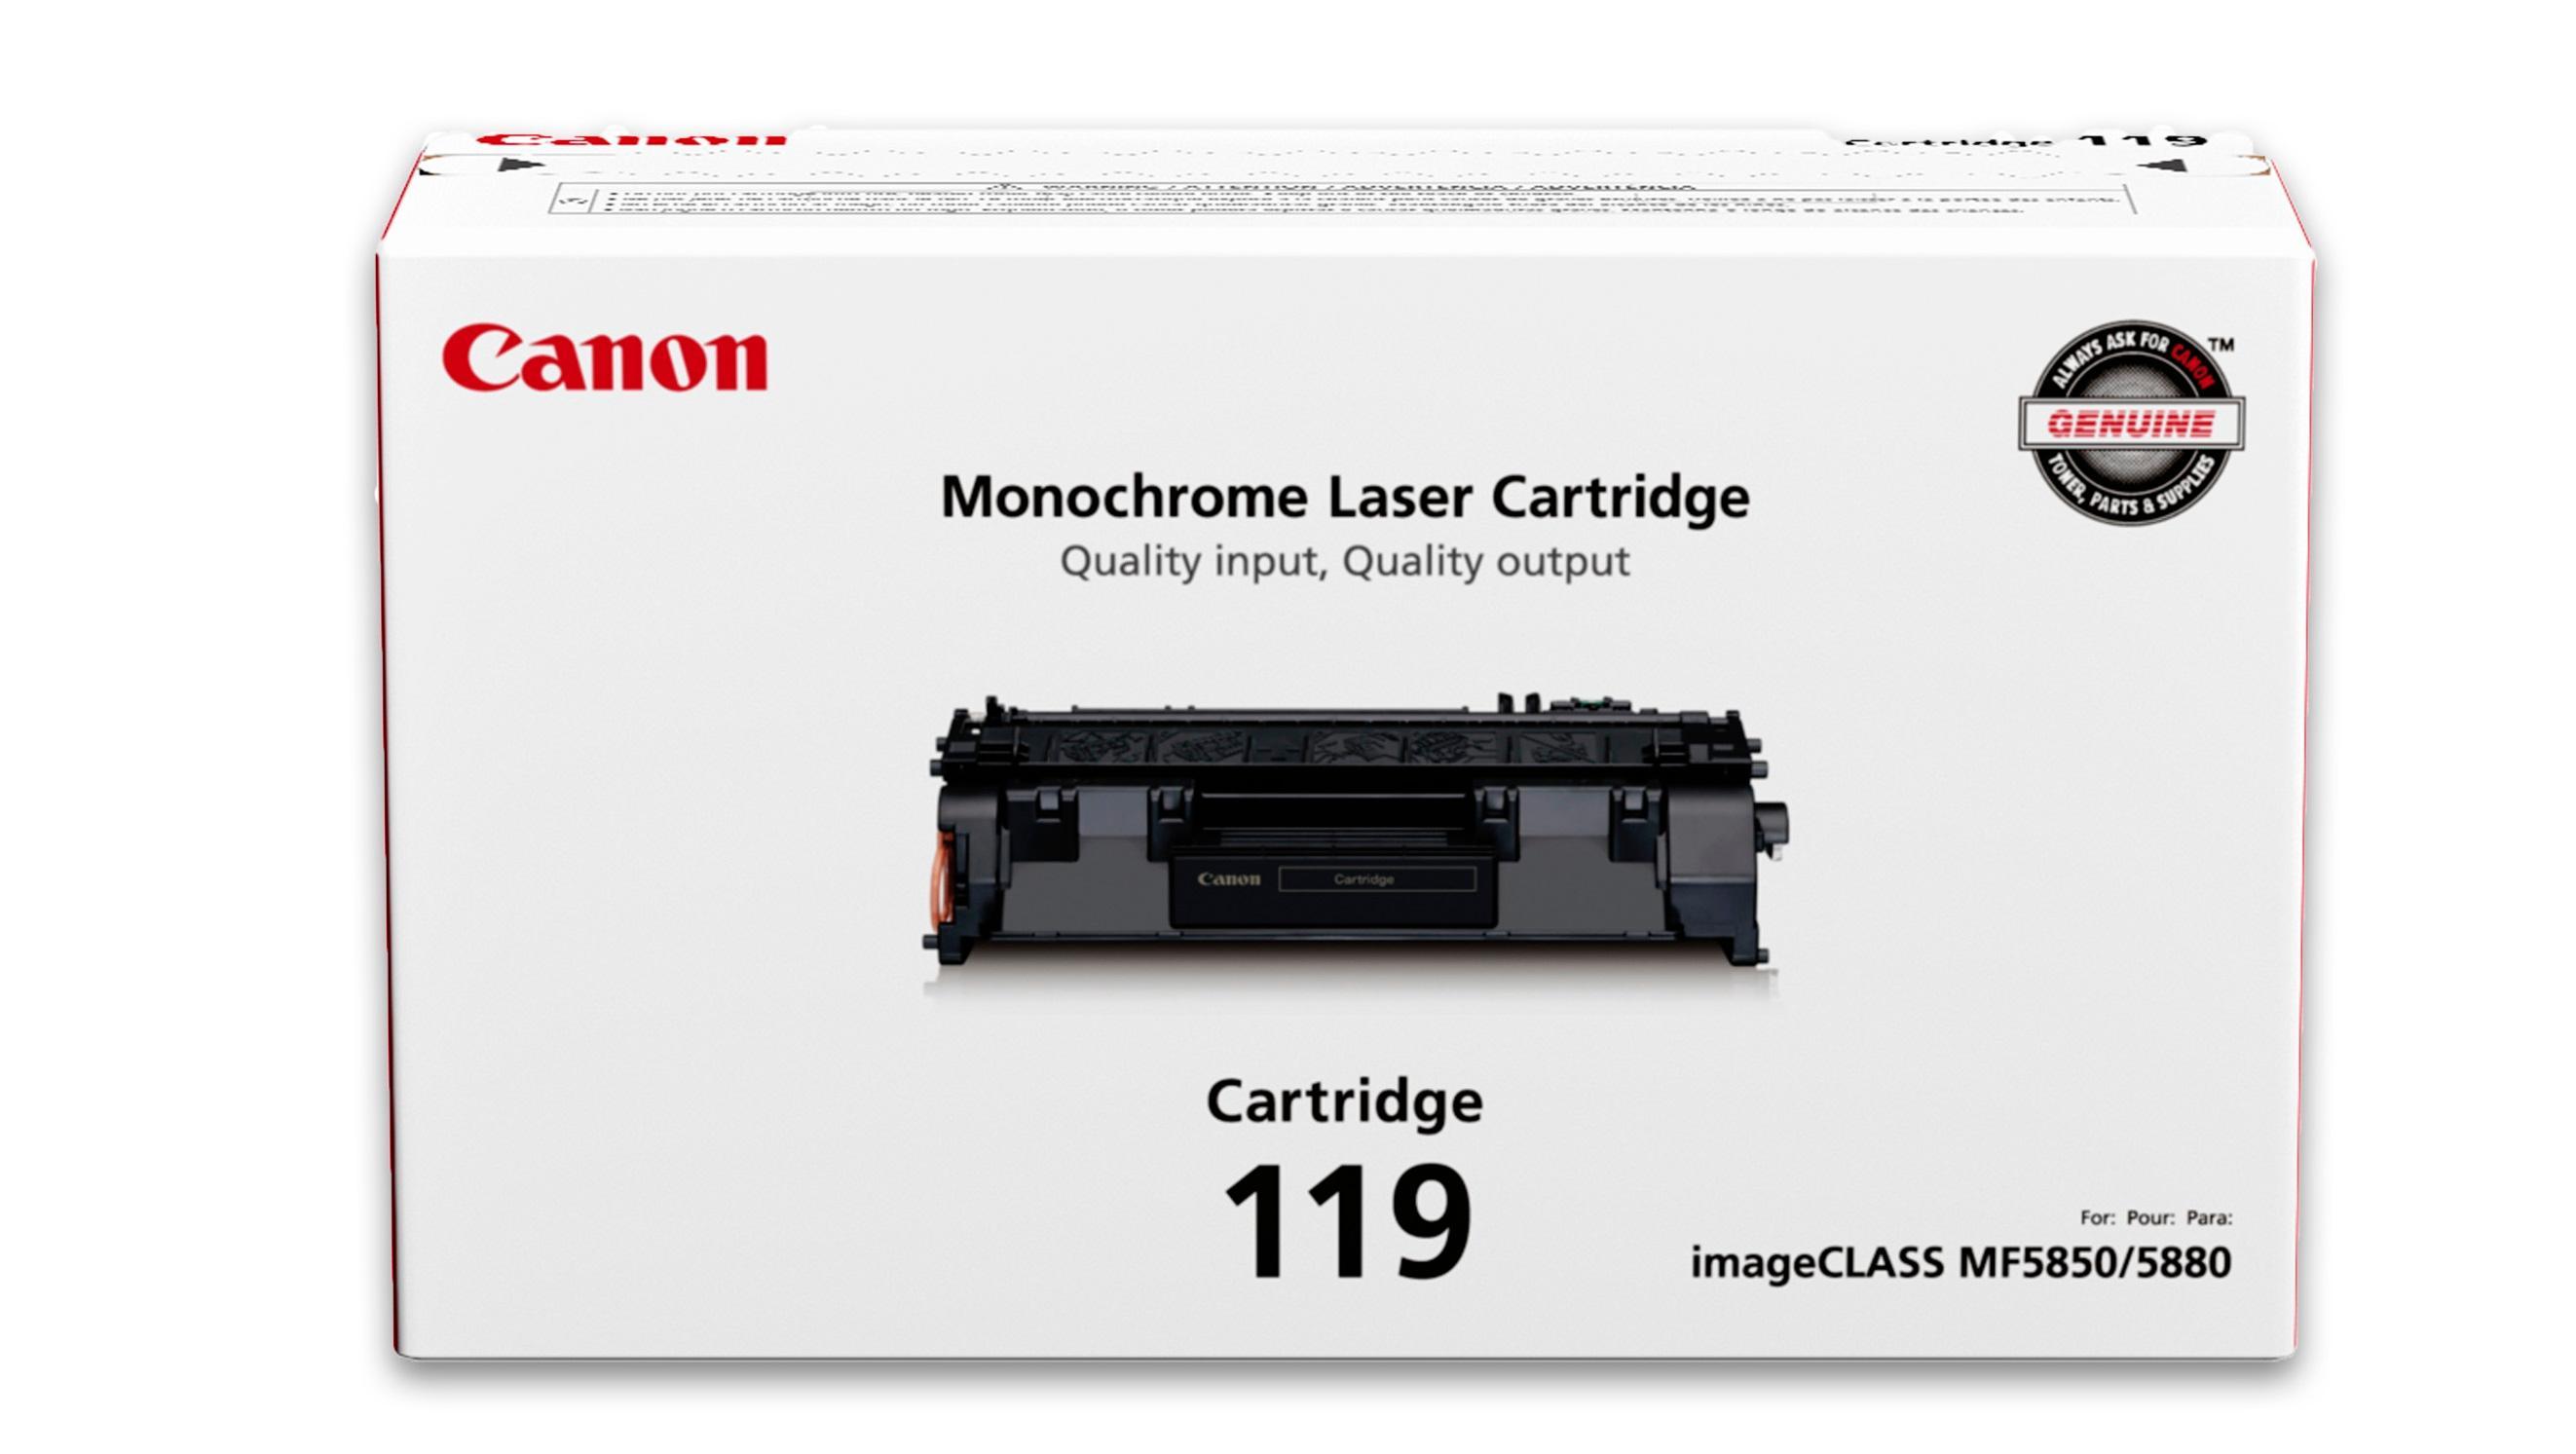 Canon imageCLASS LBP253dw Printer Generic UFR II Driver (2019)